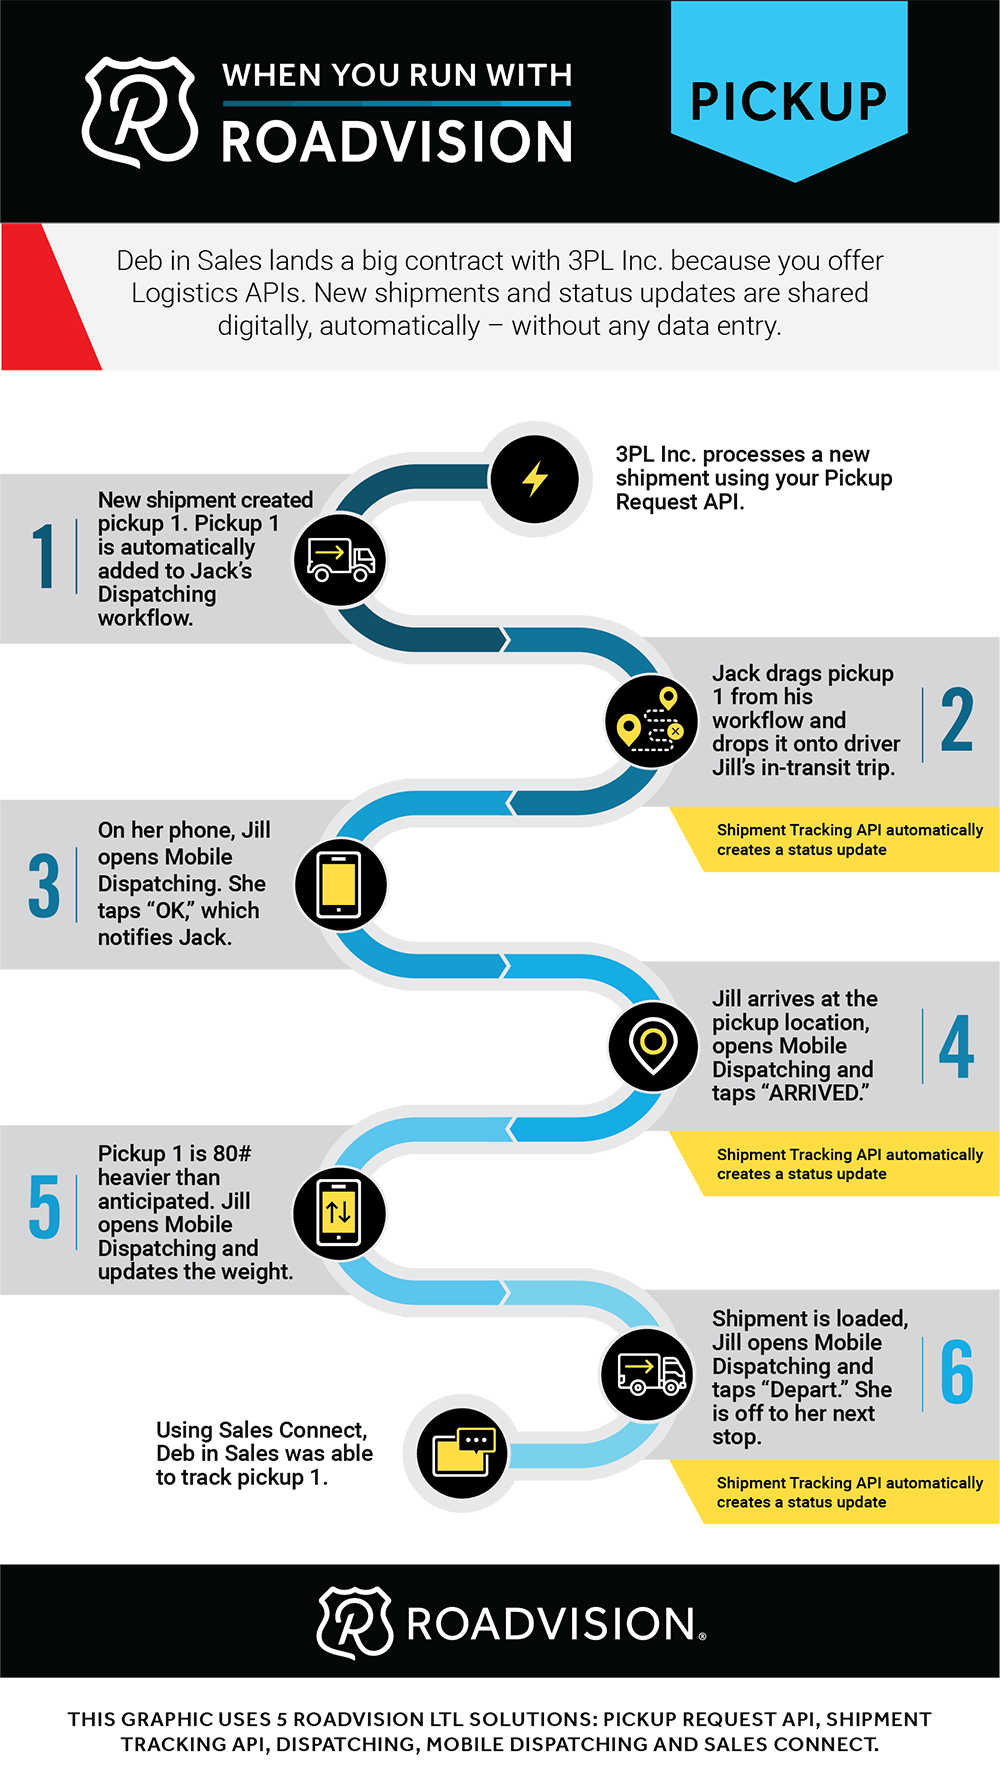 Roadvision-Pickup-Infographic_v2-1.png